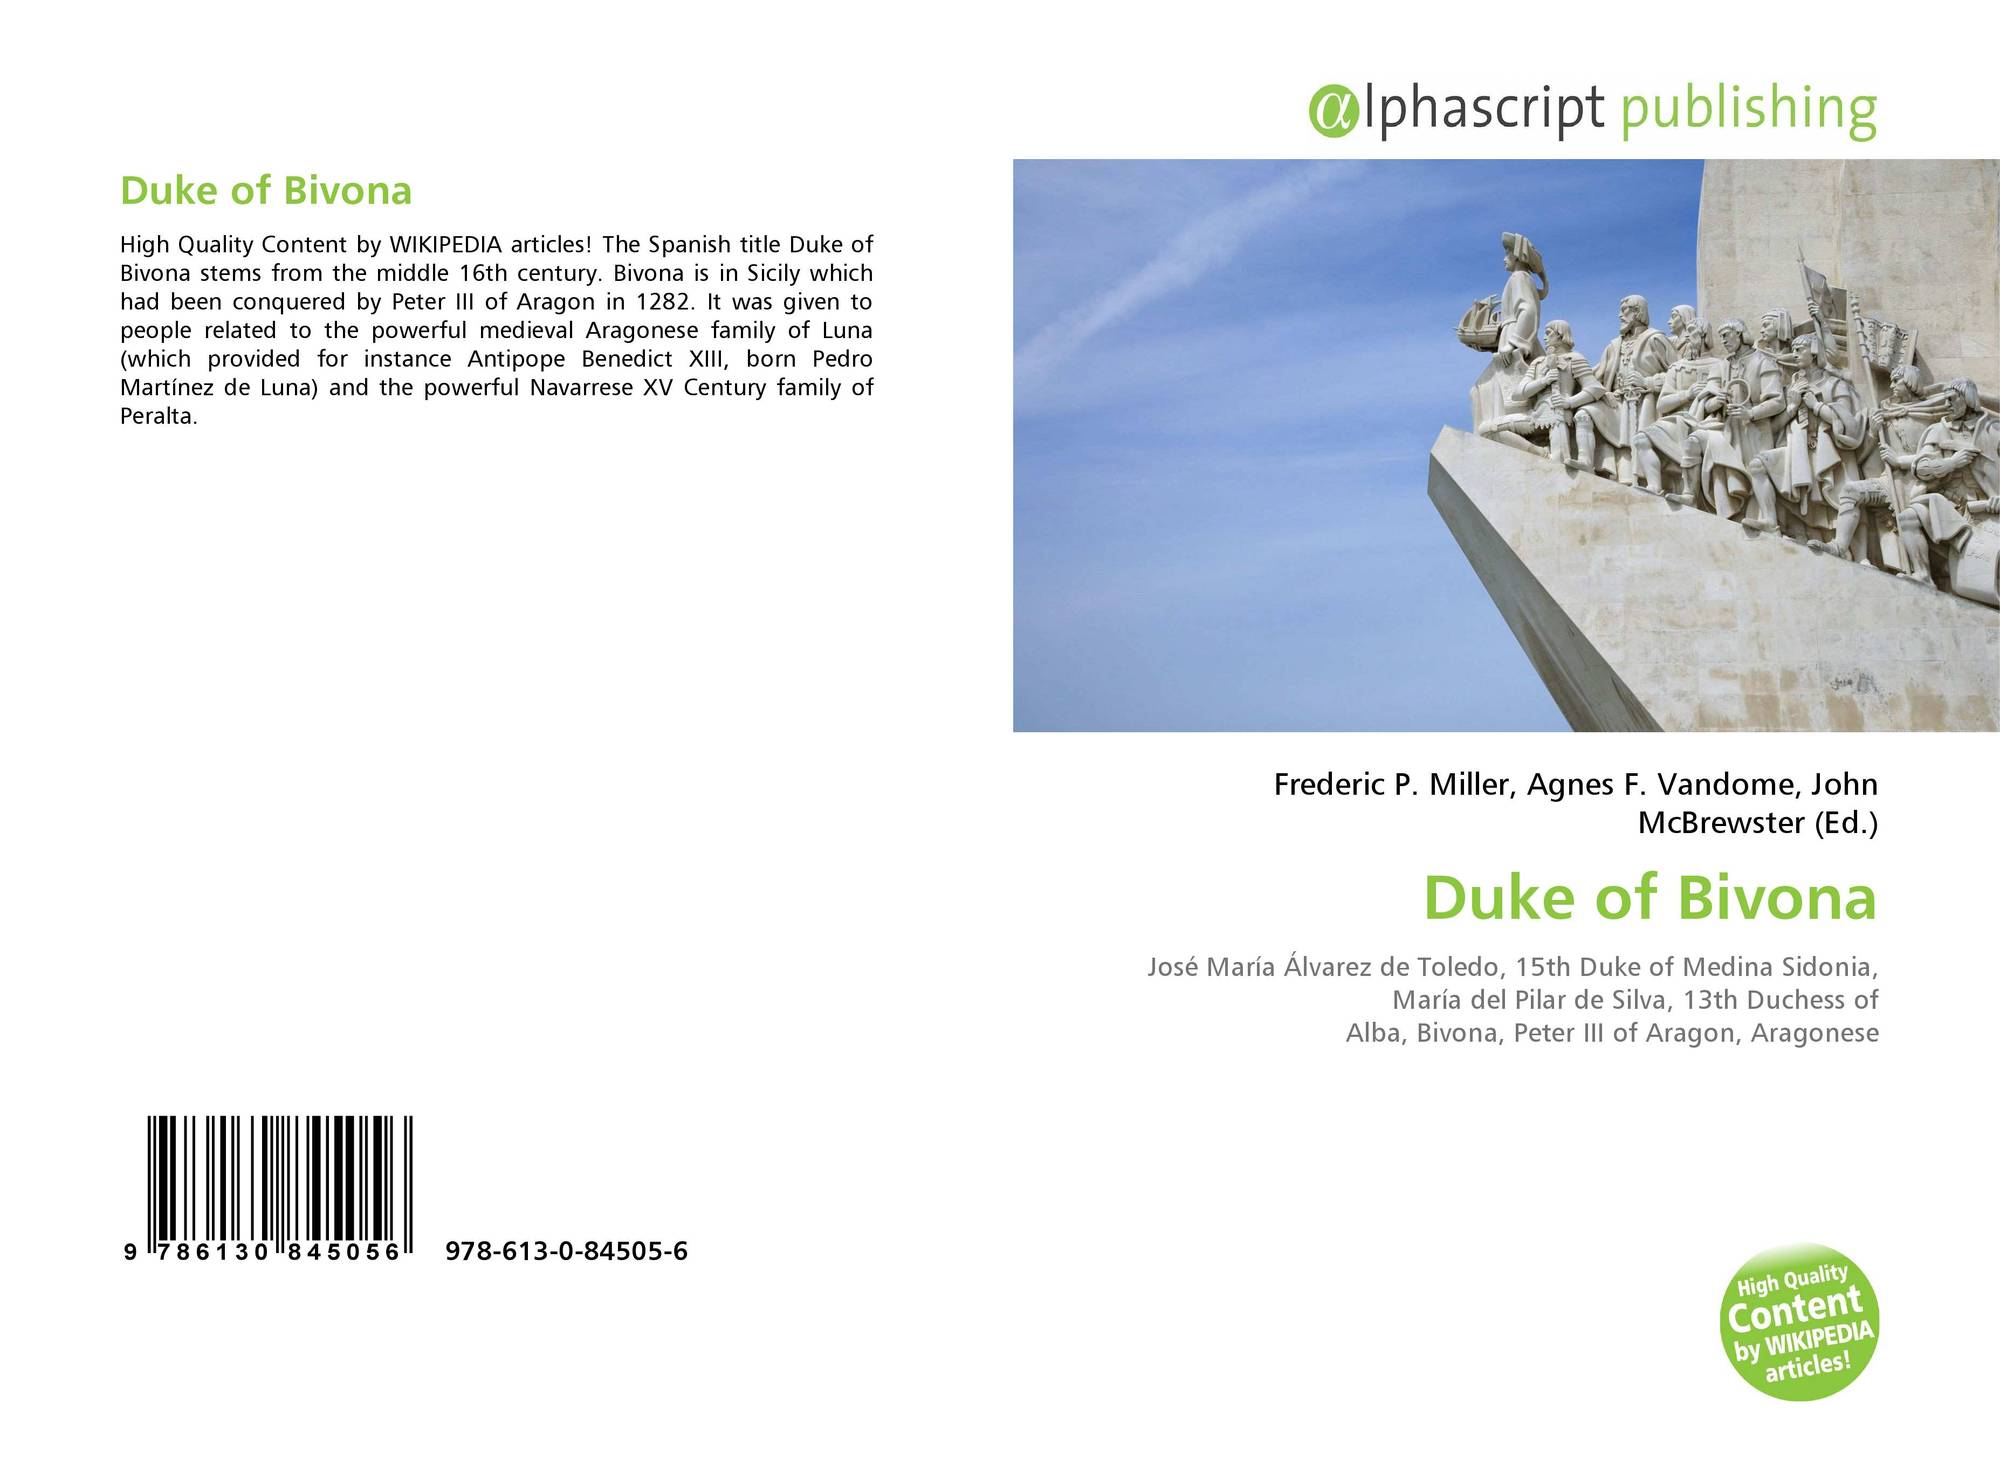 Bookcover Of Duke Bivona Omni Badge 9307e2201e5f762643a64561af3456be64a87707602f96b92ef18a9bbcada116